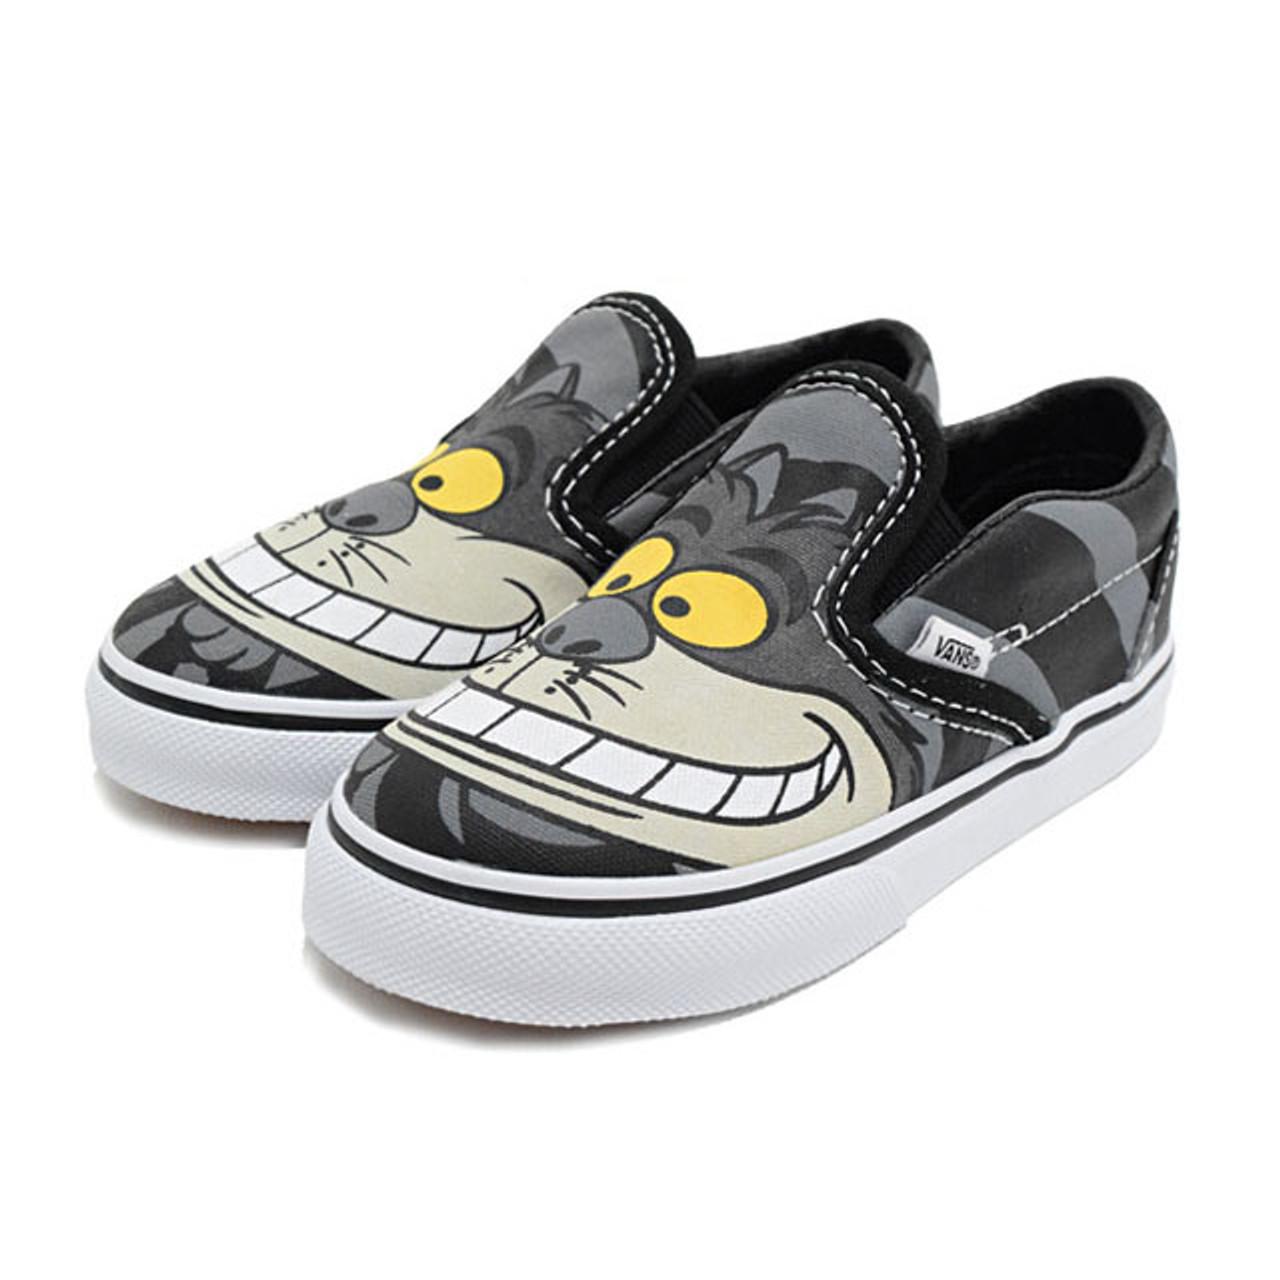 7661d5302ae8a2 Vans Kids Unisex Slip-On Disney Cheshire Cat Shoes